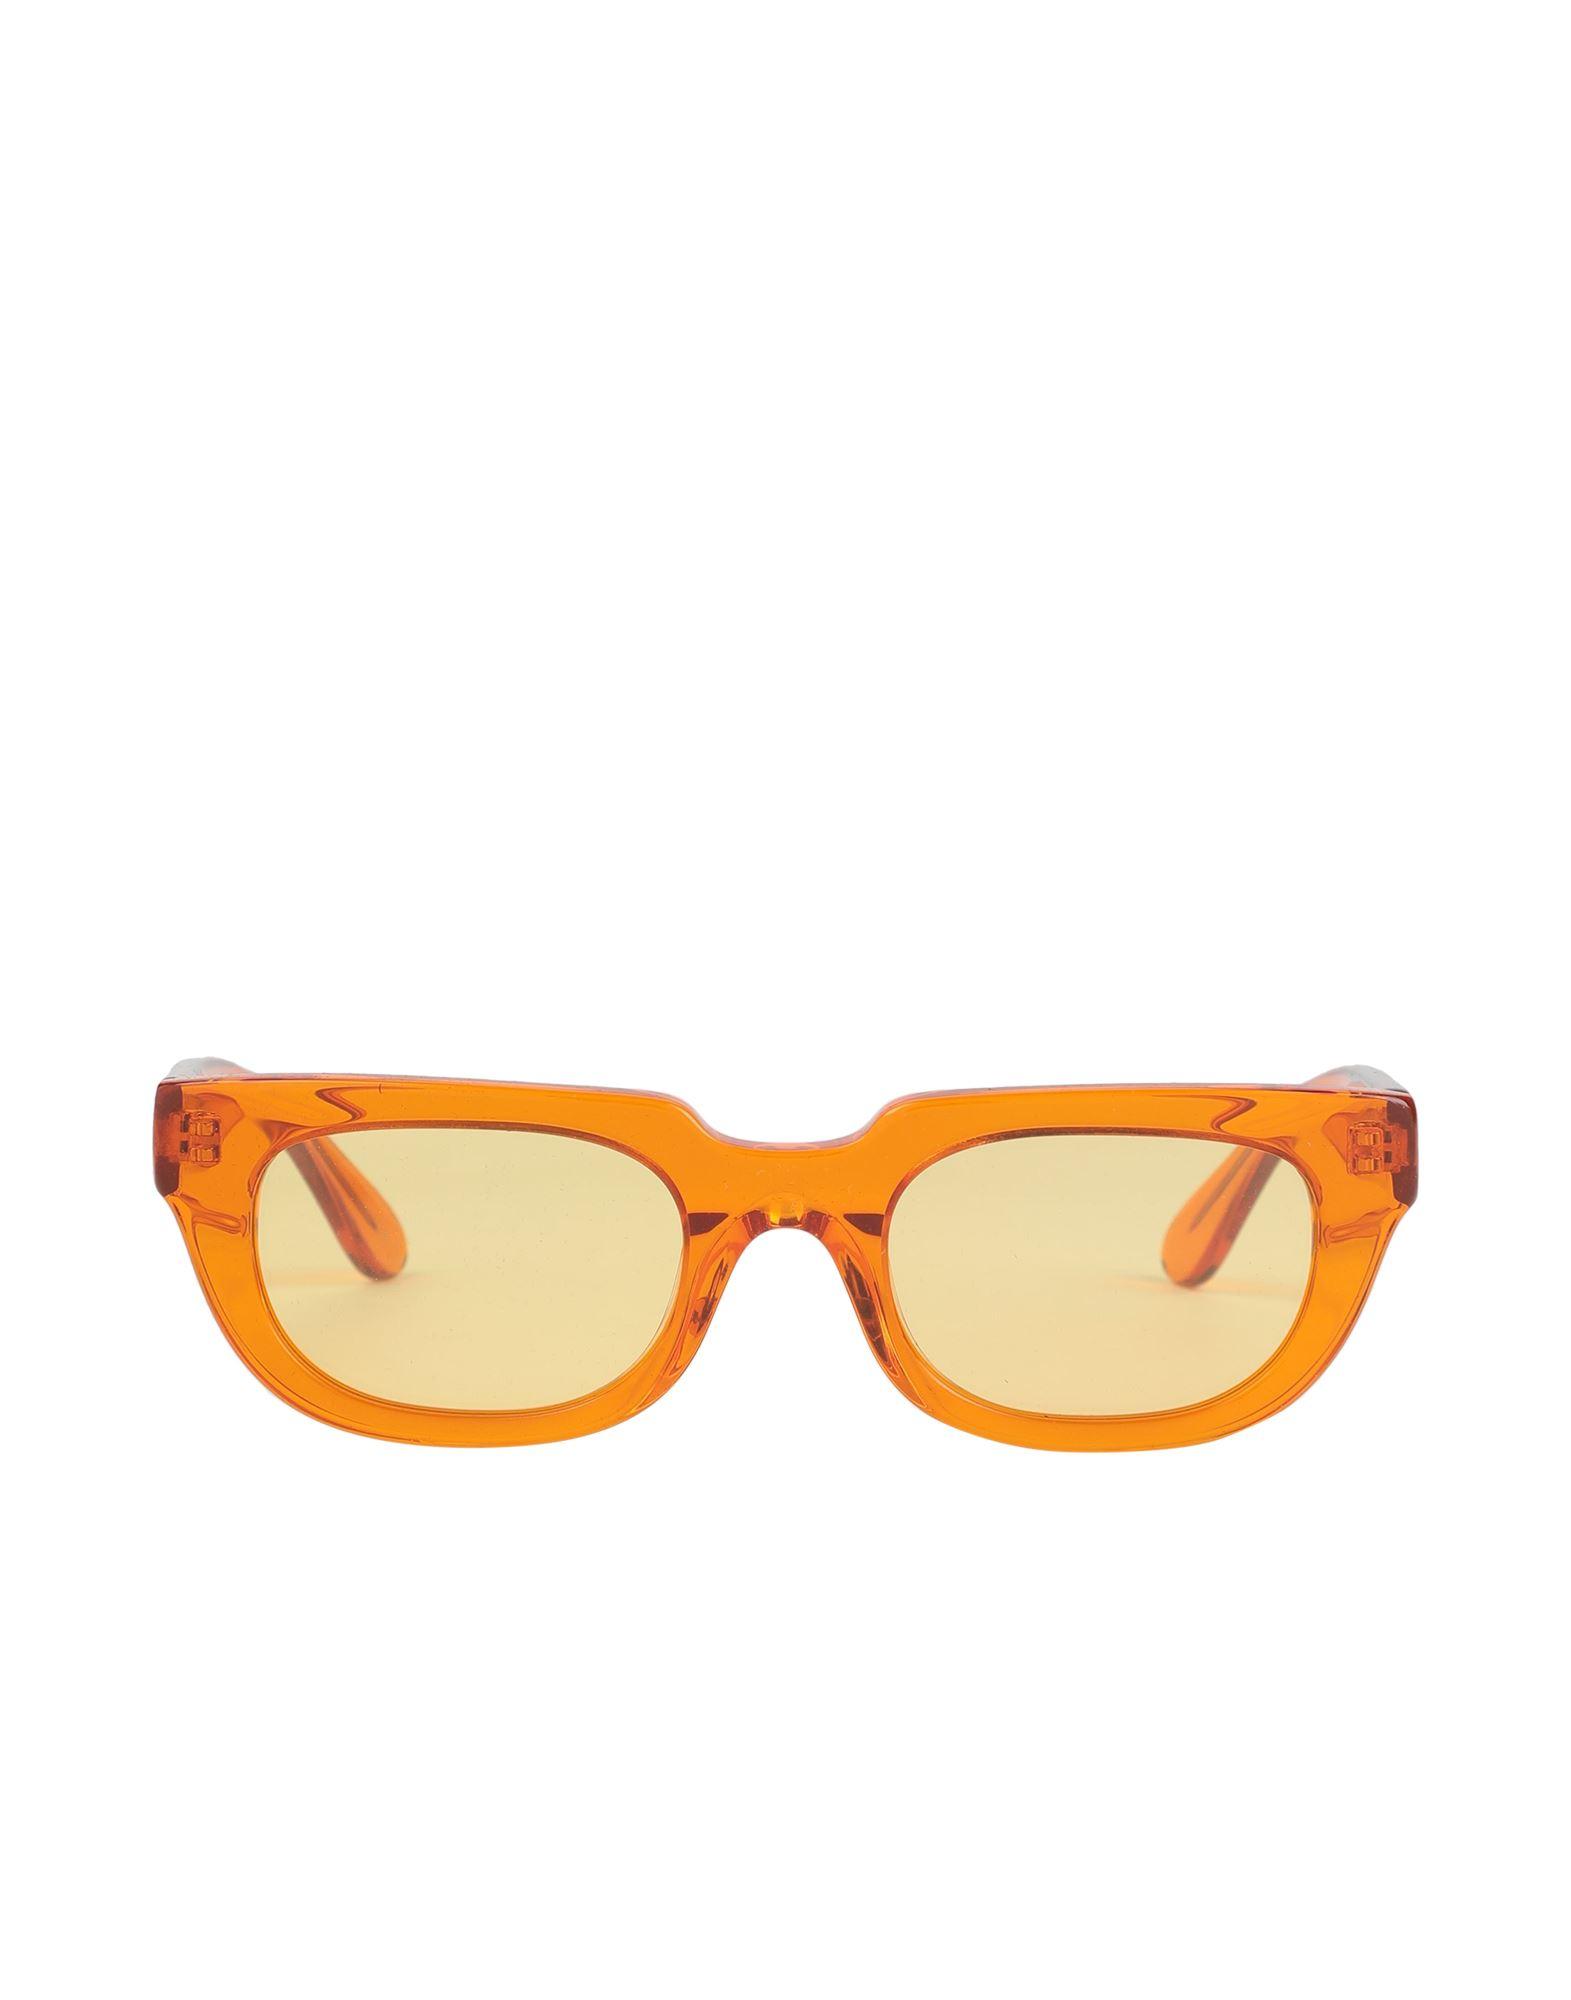 HAN KJØBENHAVN Sunglasses - Item 46717735